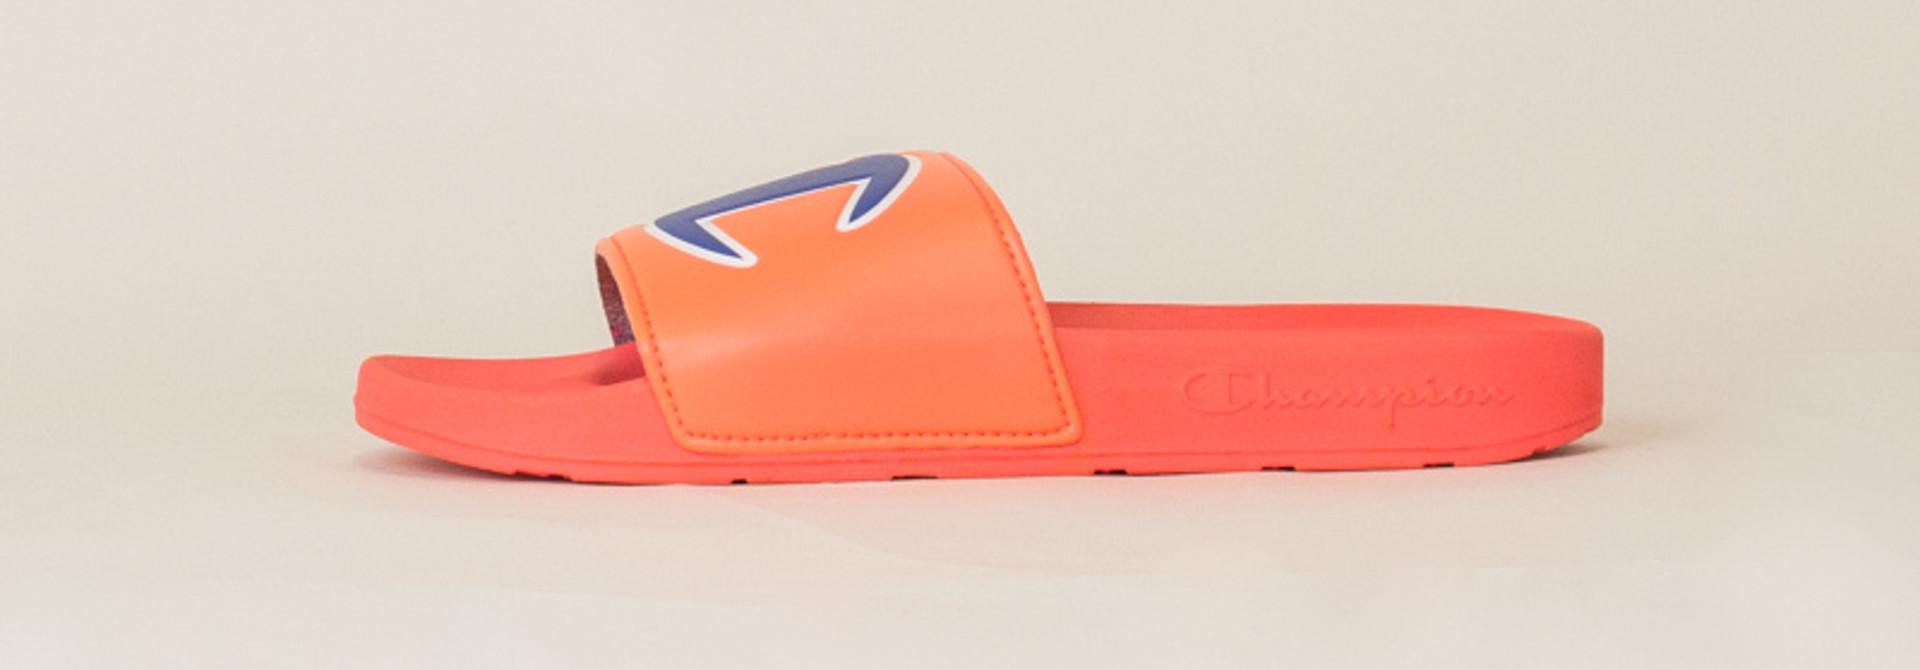 Champion IPO Slide Sandals - Groovy